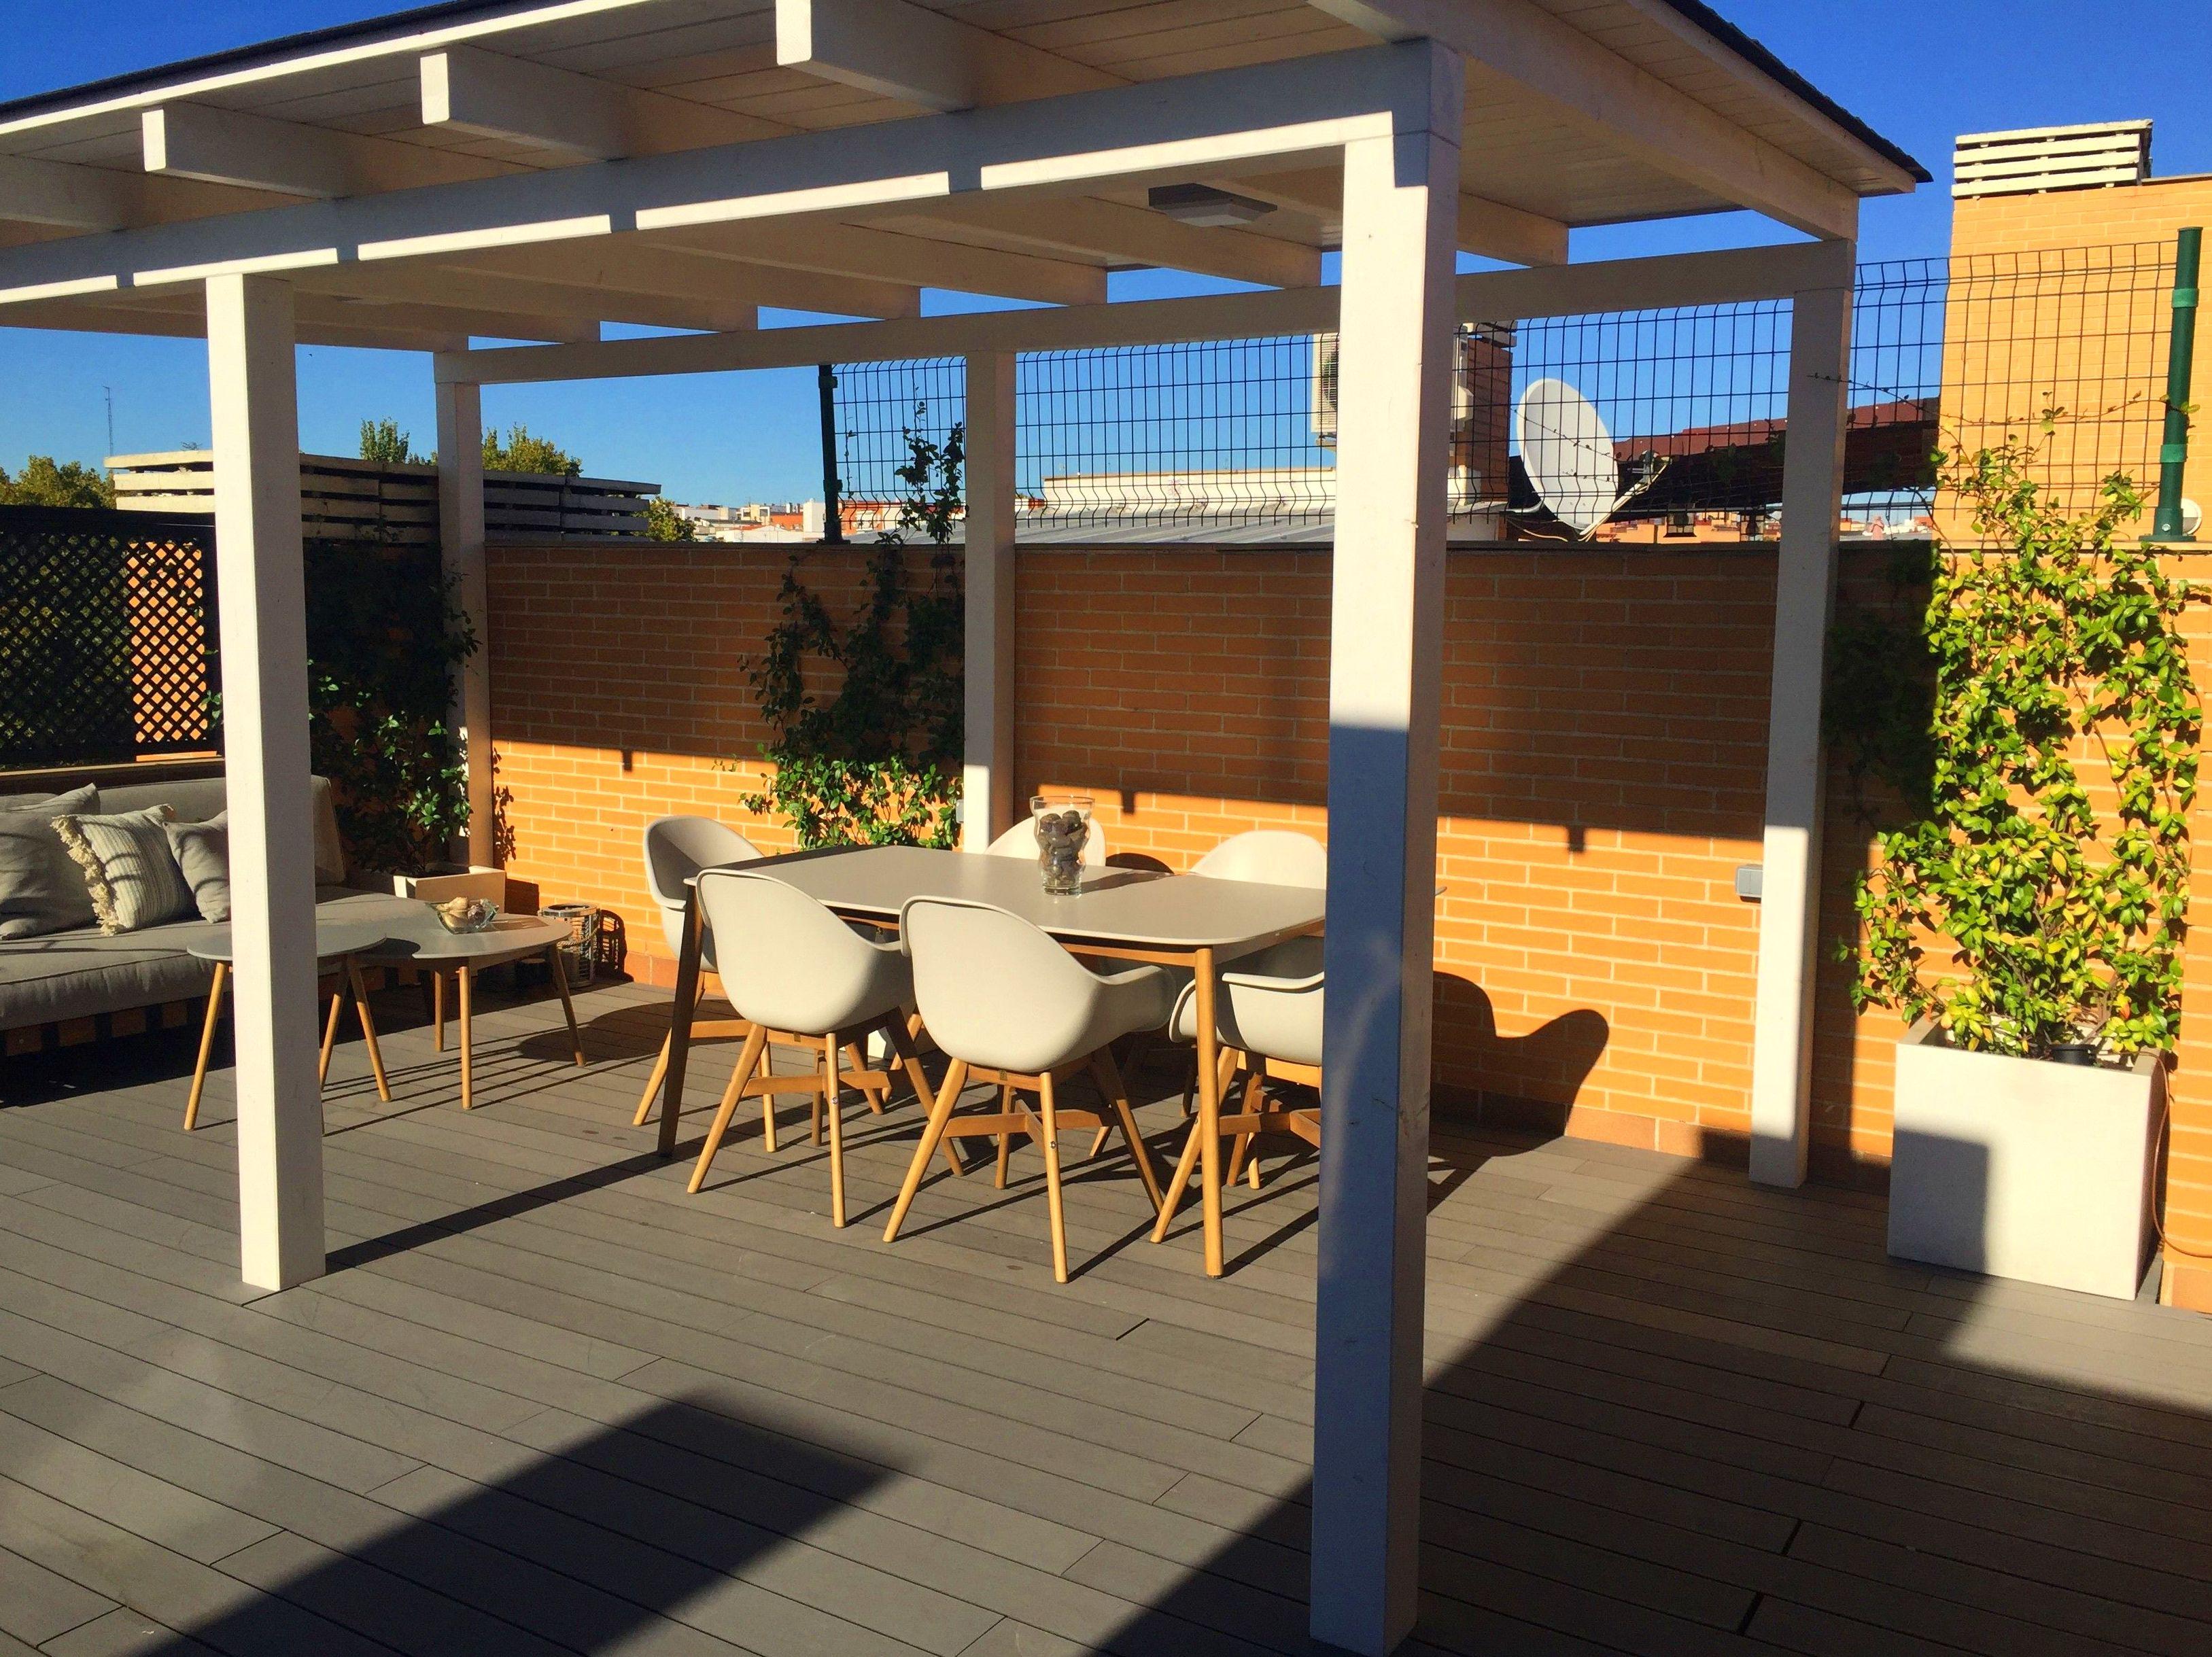 Proyecto en terraza. Porche de madera blanco. Tarima composite.